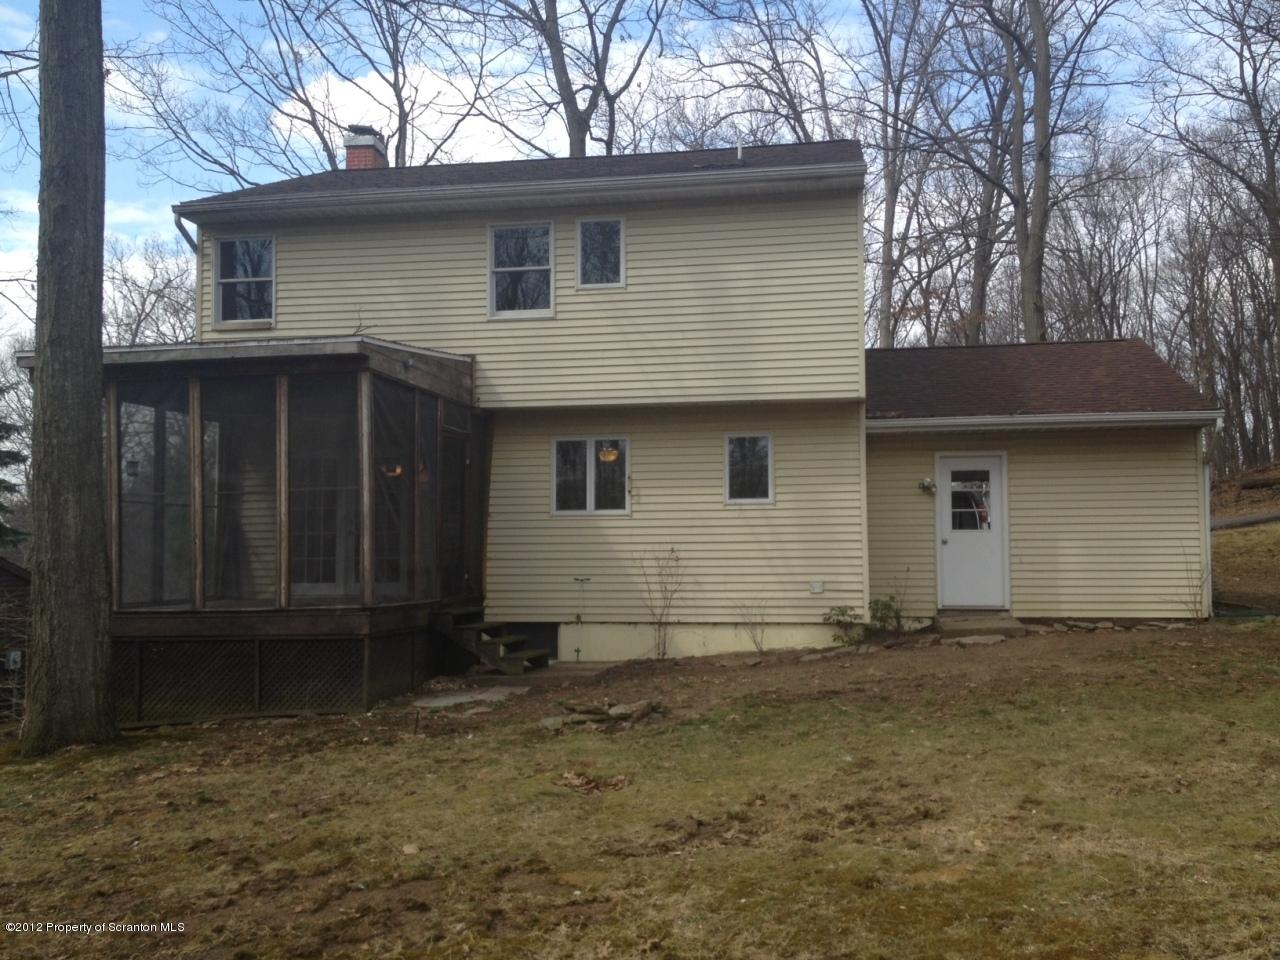 63 Harford Ave, Shavertown, Pennsylvania 18708, 3 Bedrooms Bedrooms, 7 Rooms Rooms,3 BathroomsBathrooms,Single Family,For Sale,Harford,12-1205